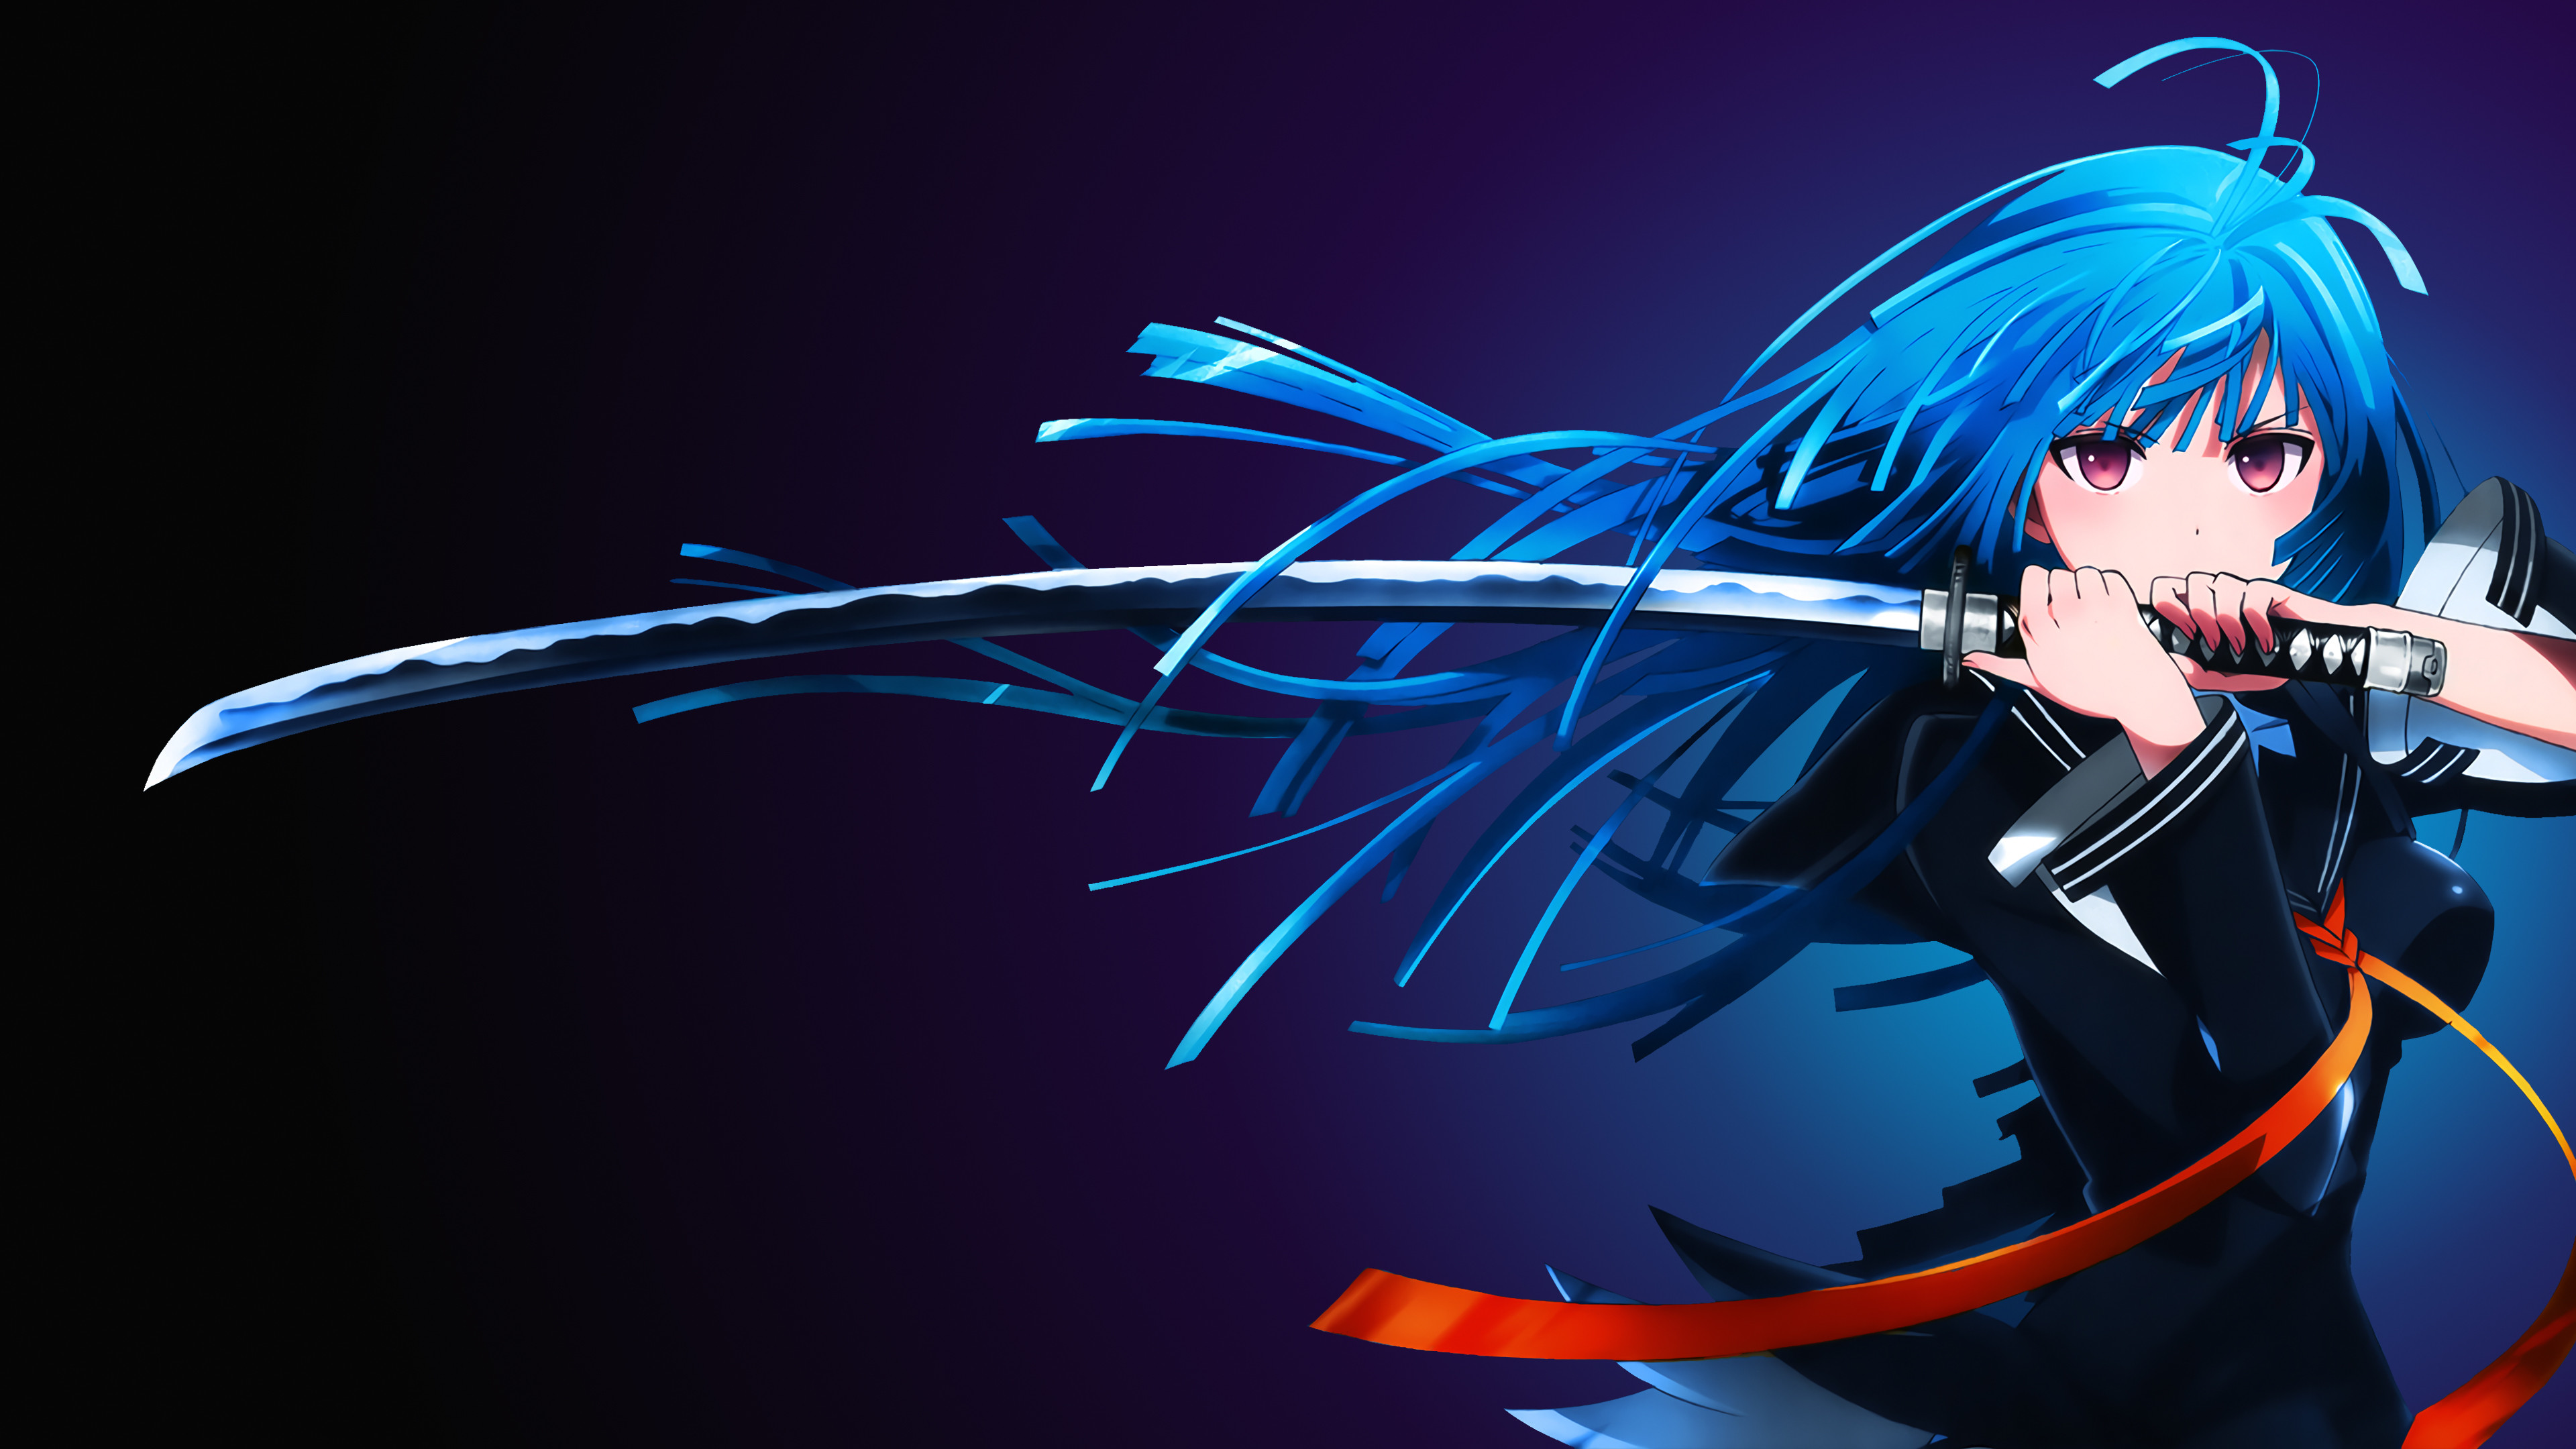 Beautiful anime wallpaper from Black Bullet uploaded by – Tendou Kisara